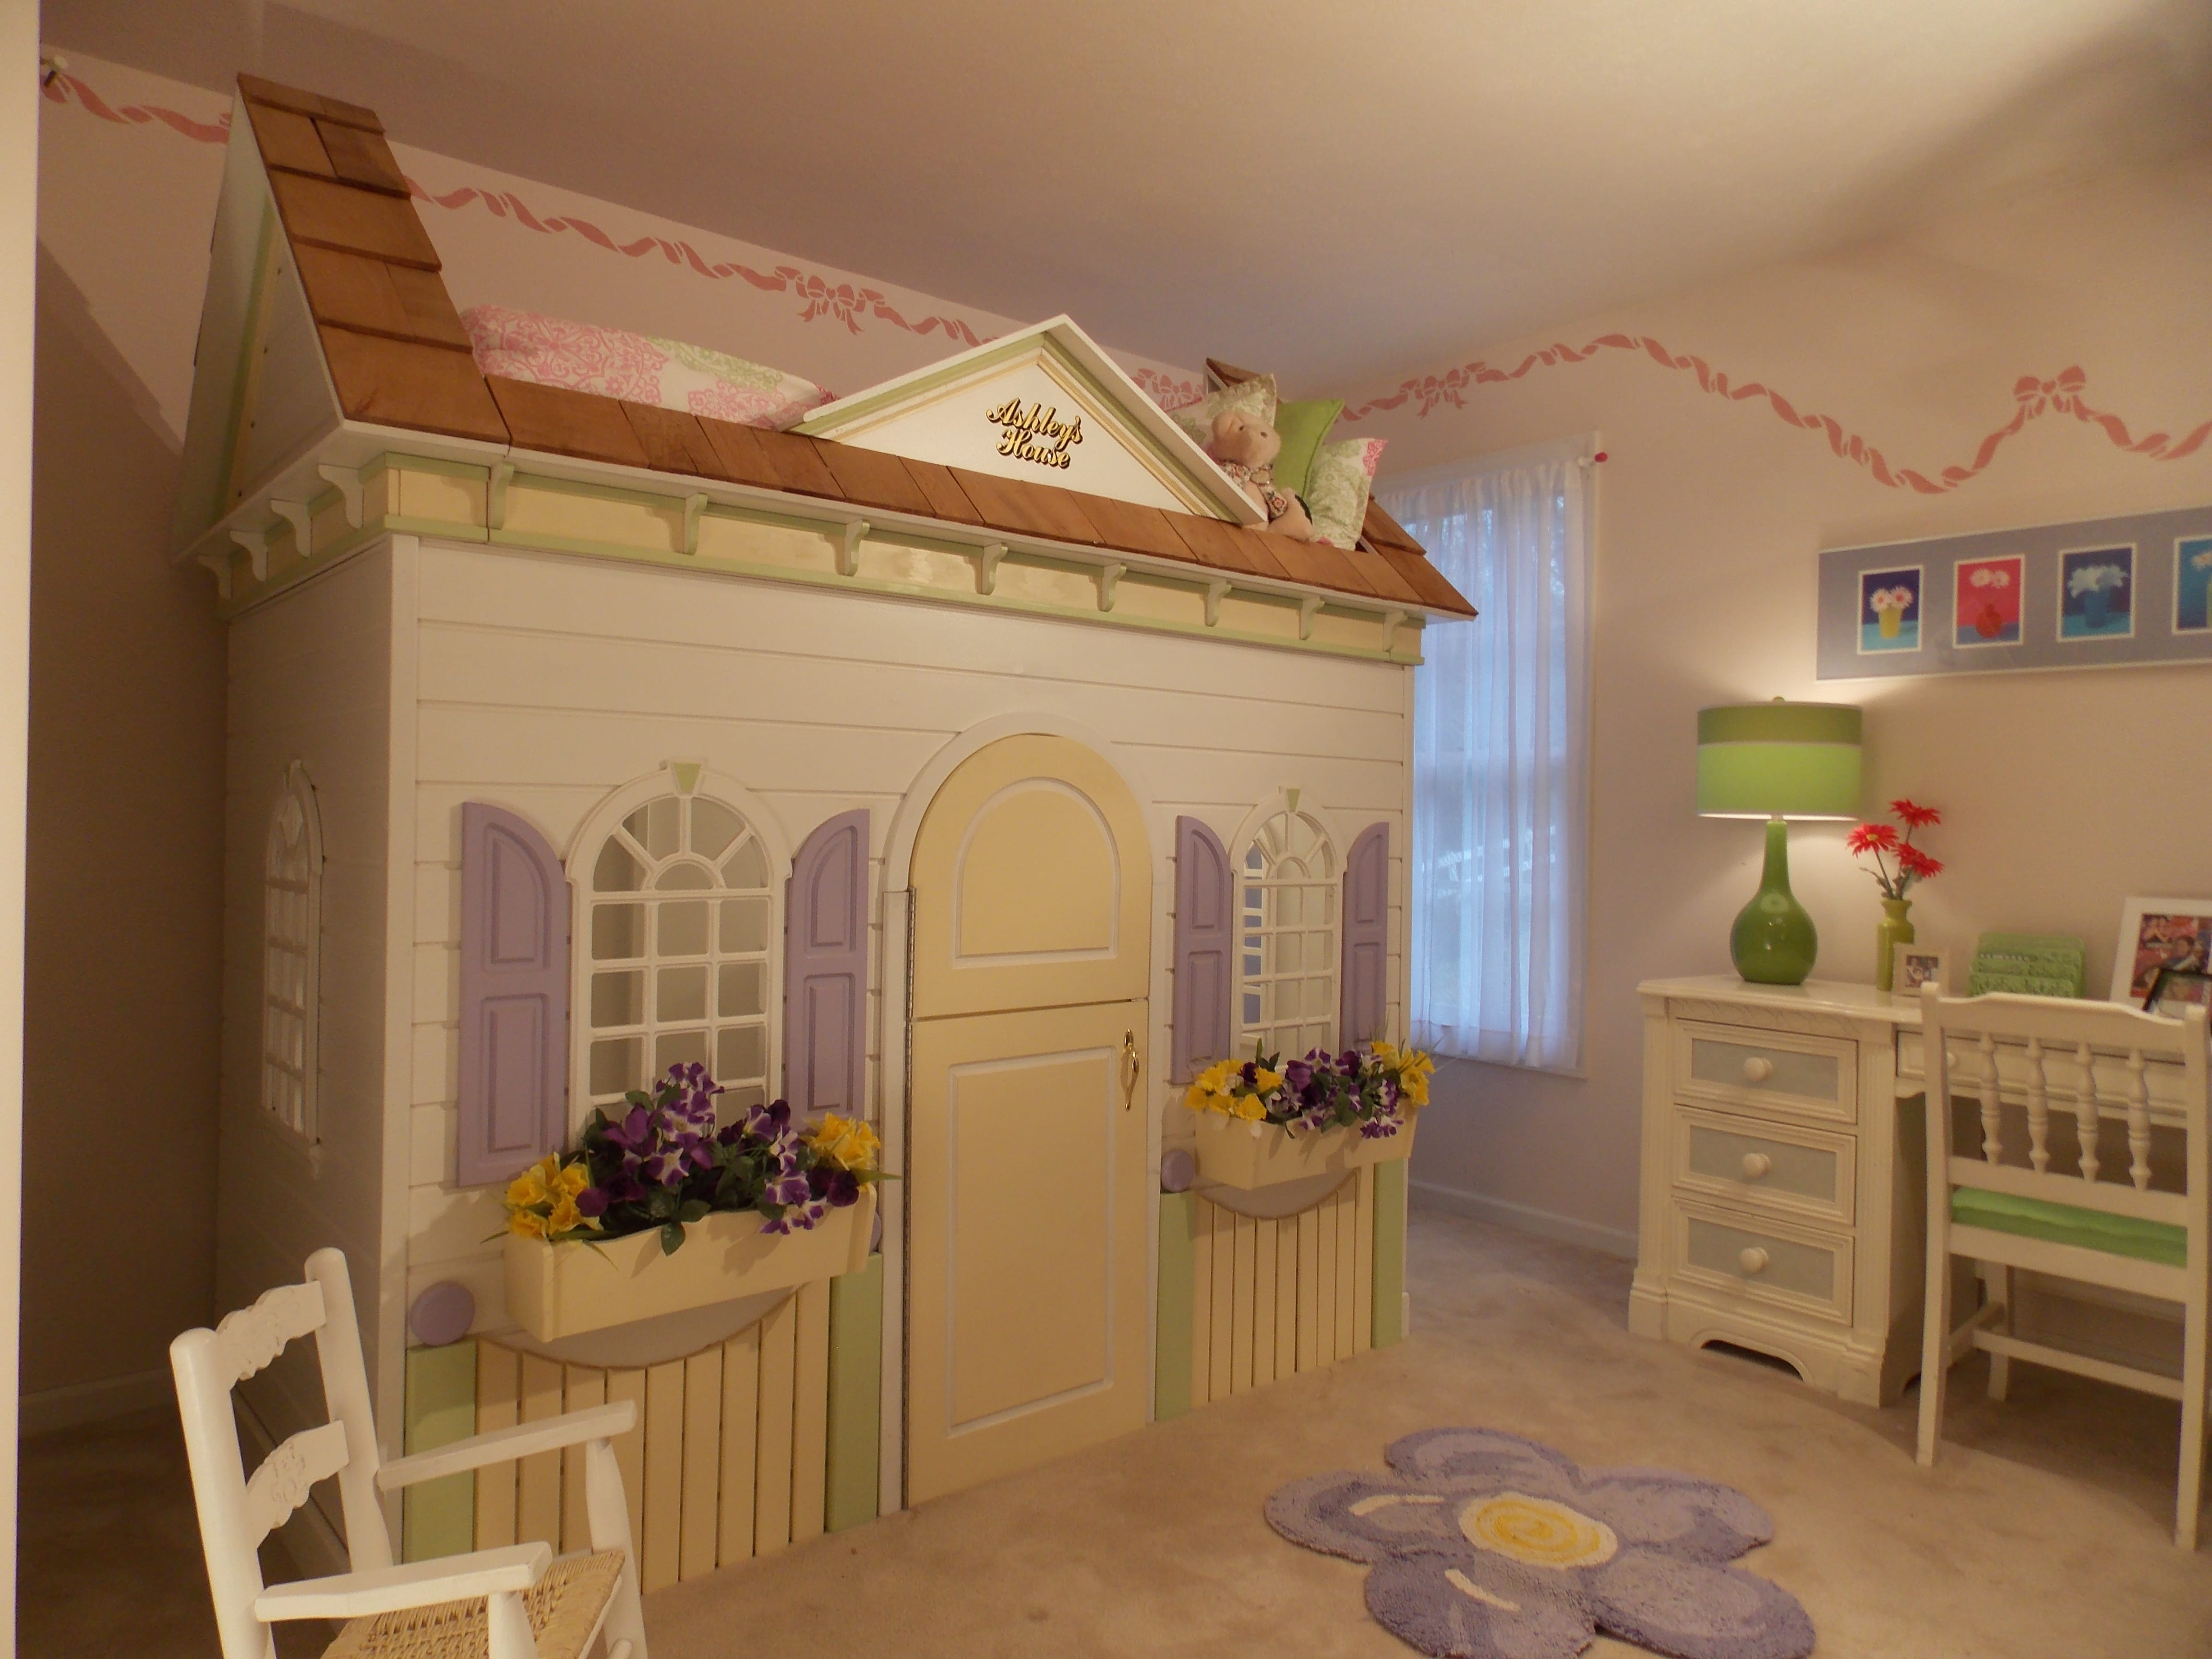 Daffodil Dreambed Lilliput Play Homes